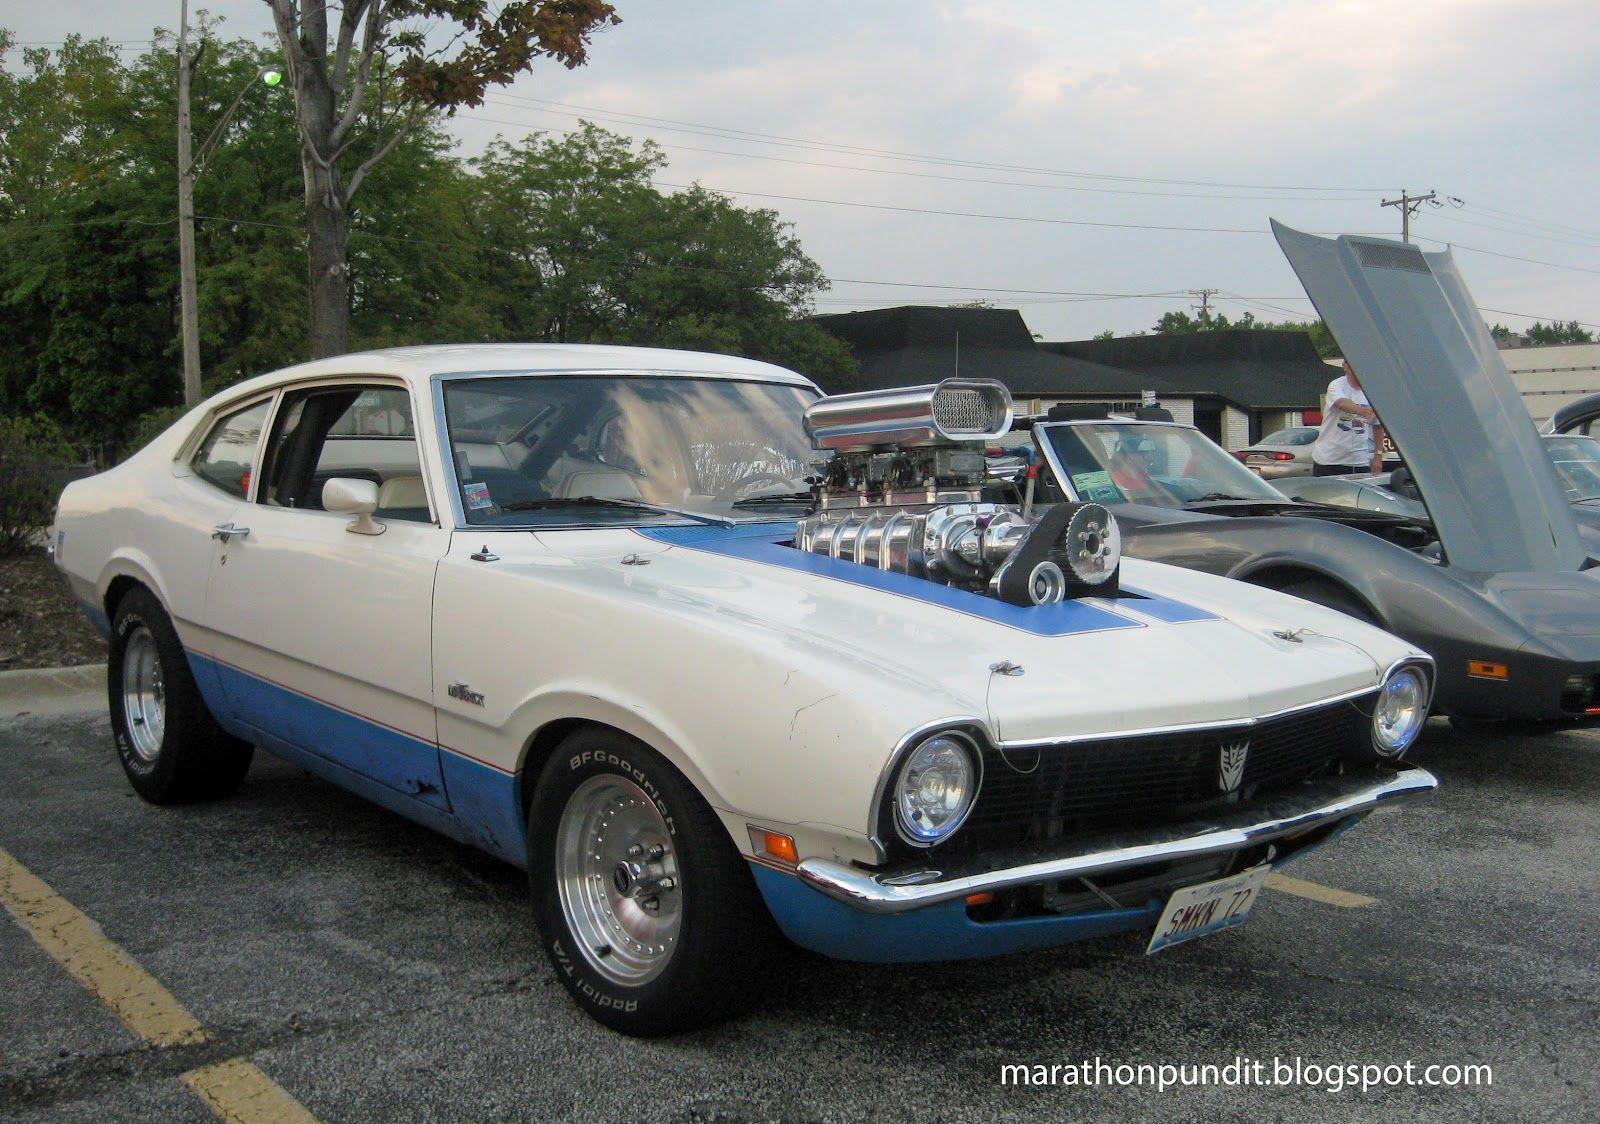 My Classic Car: Bill's 1972 Ford Maverick Grabber | Classic Car News